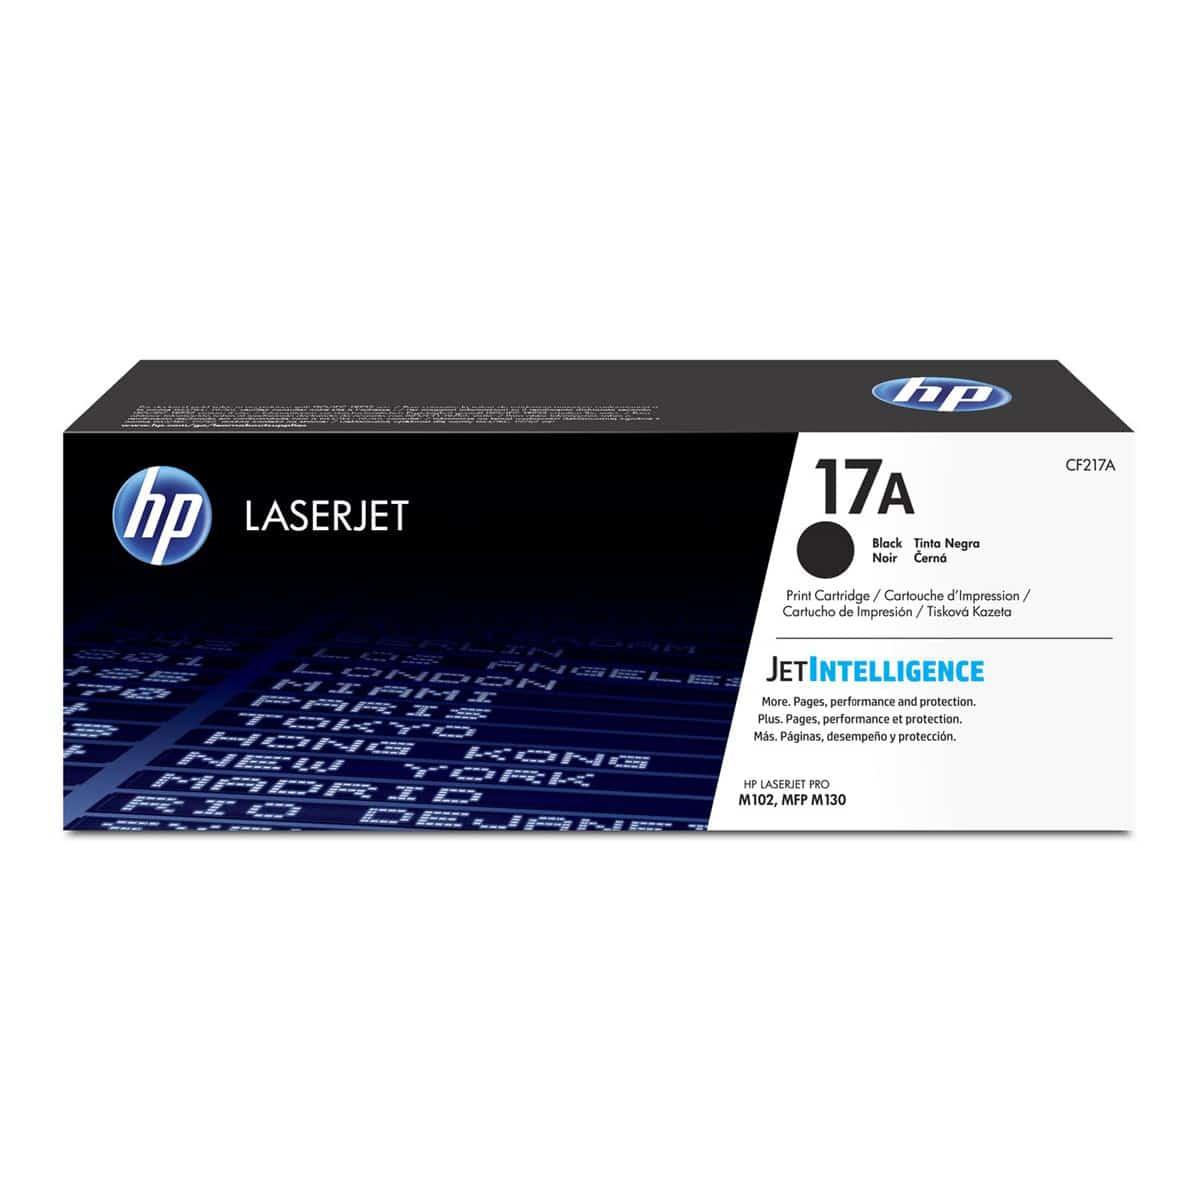 HP CF217A 17A Toner Cartridge, HP Supplies Manchester